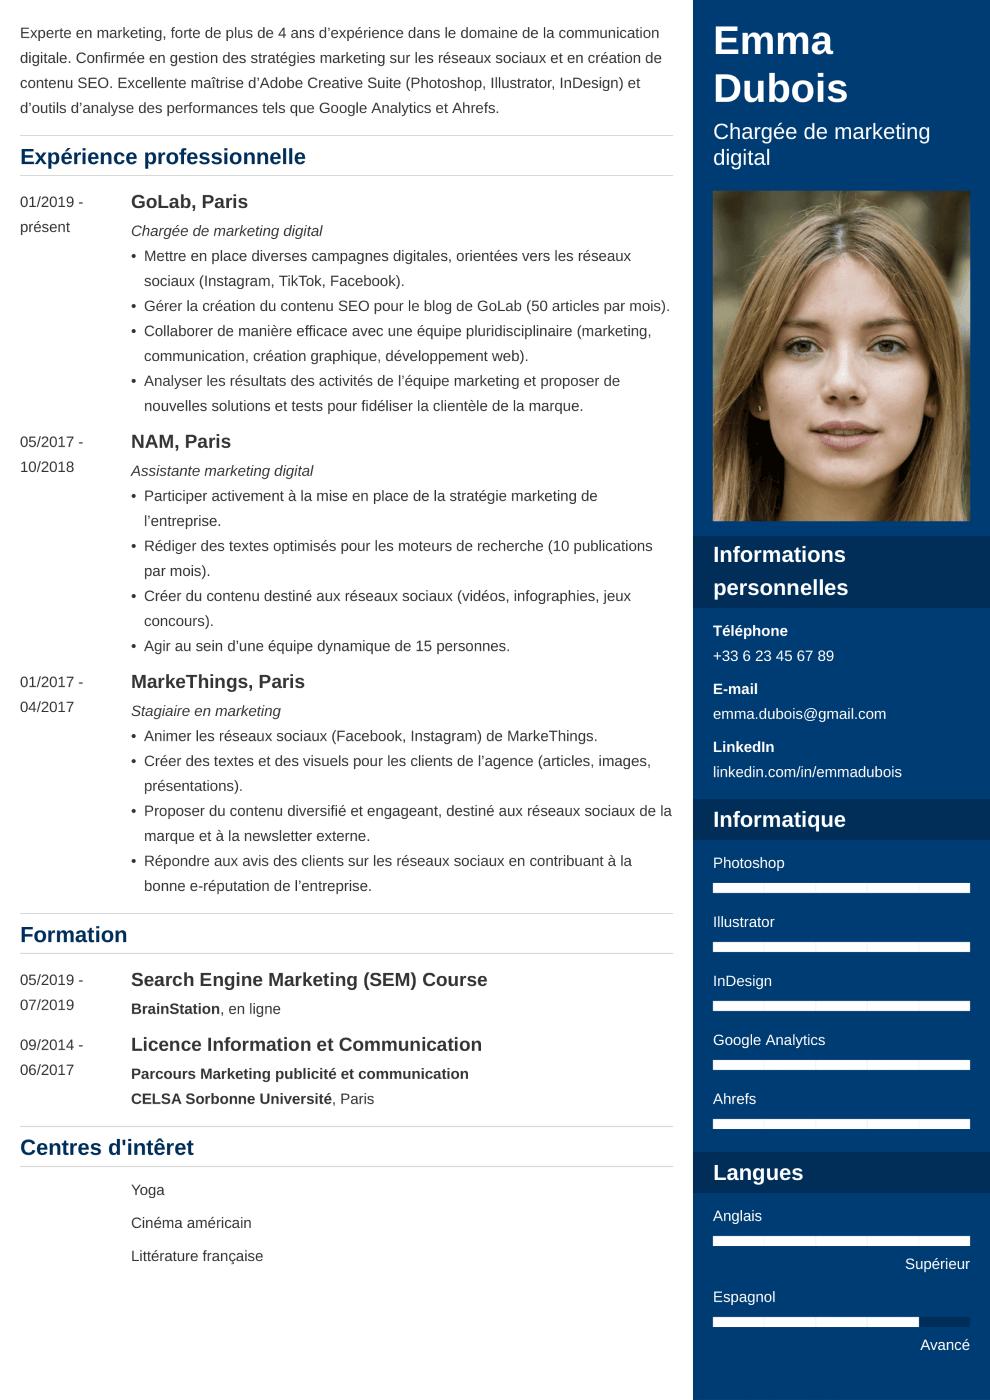 Modèle CV Enfold